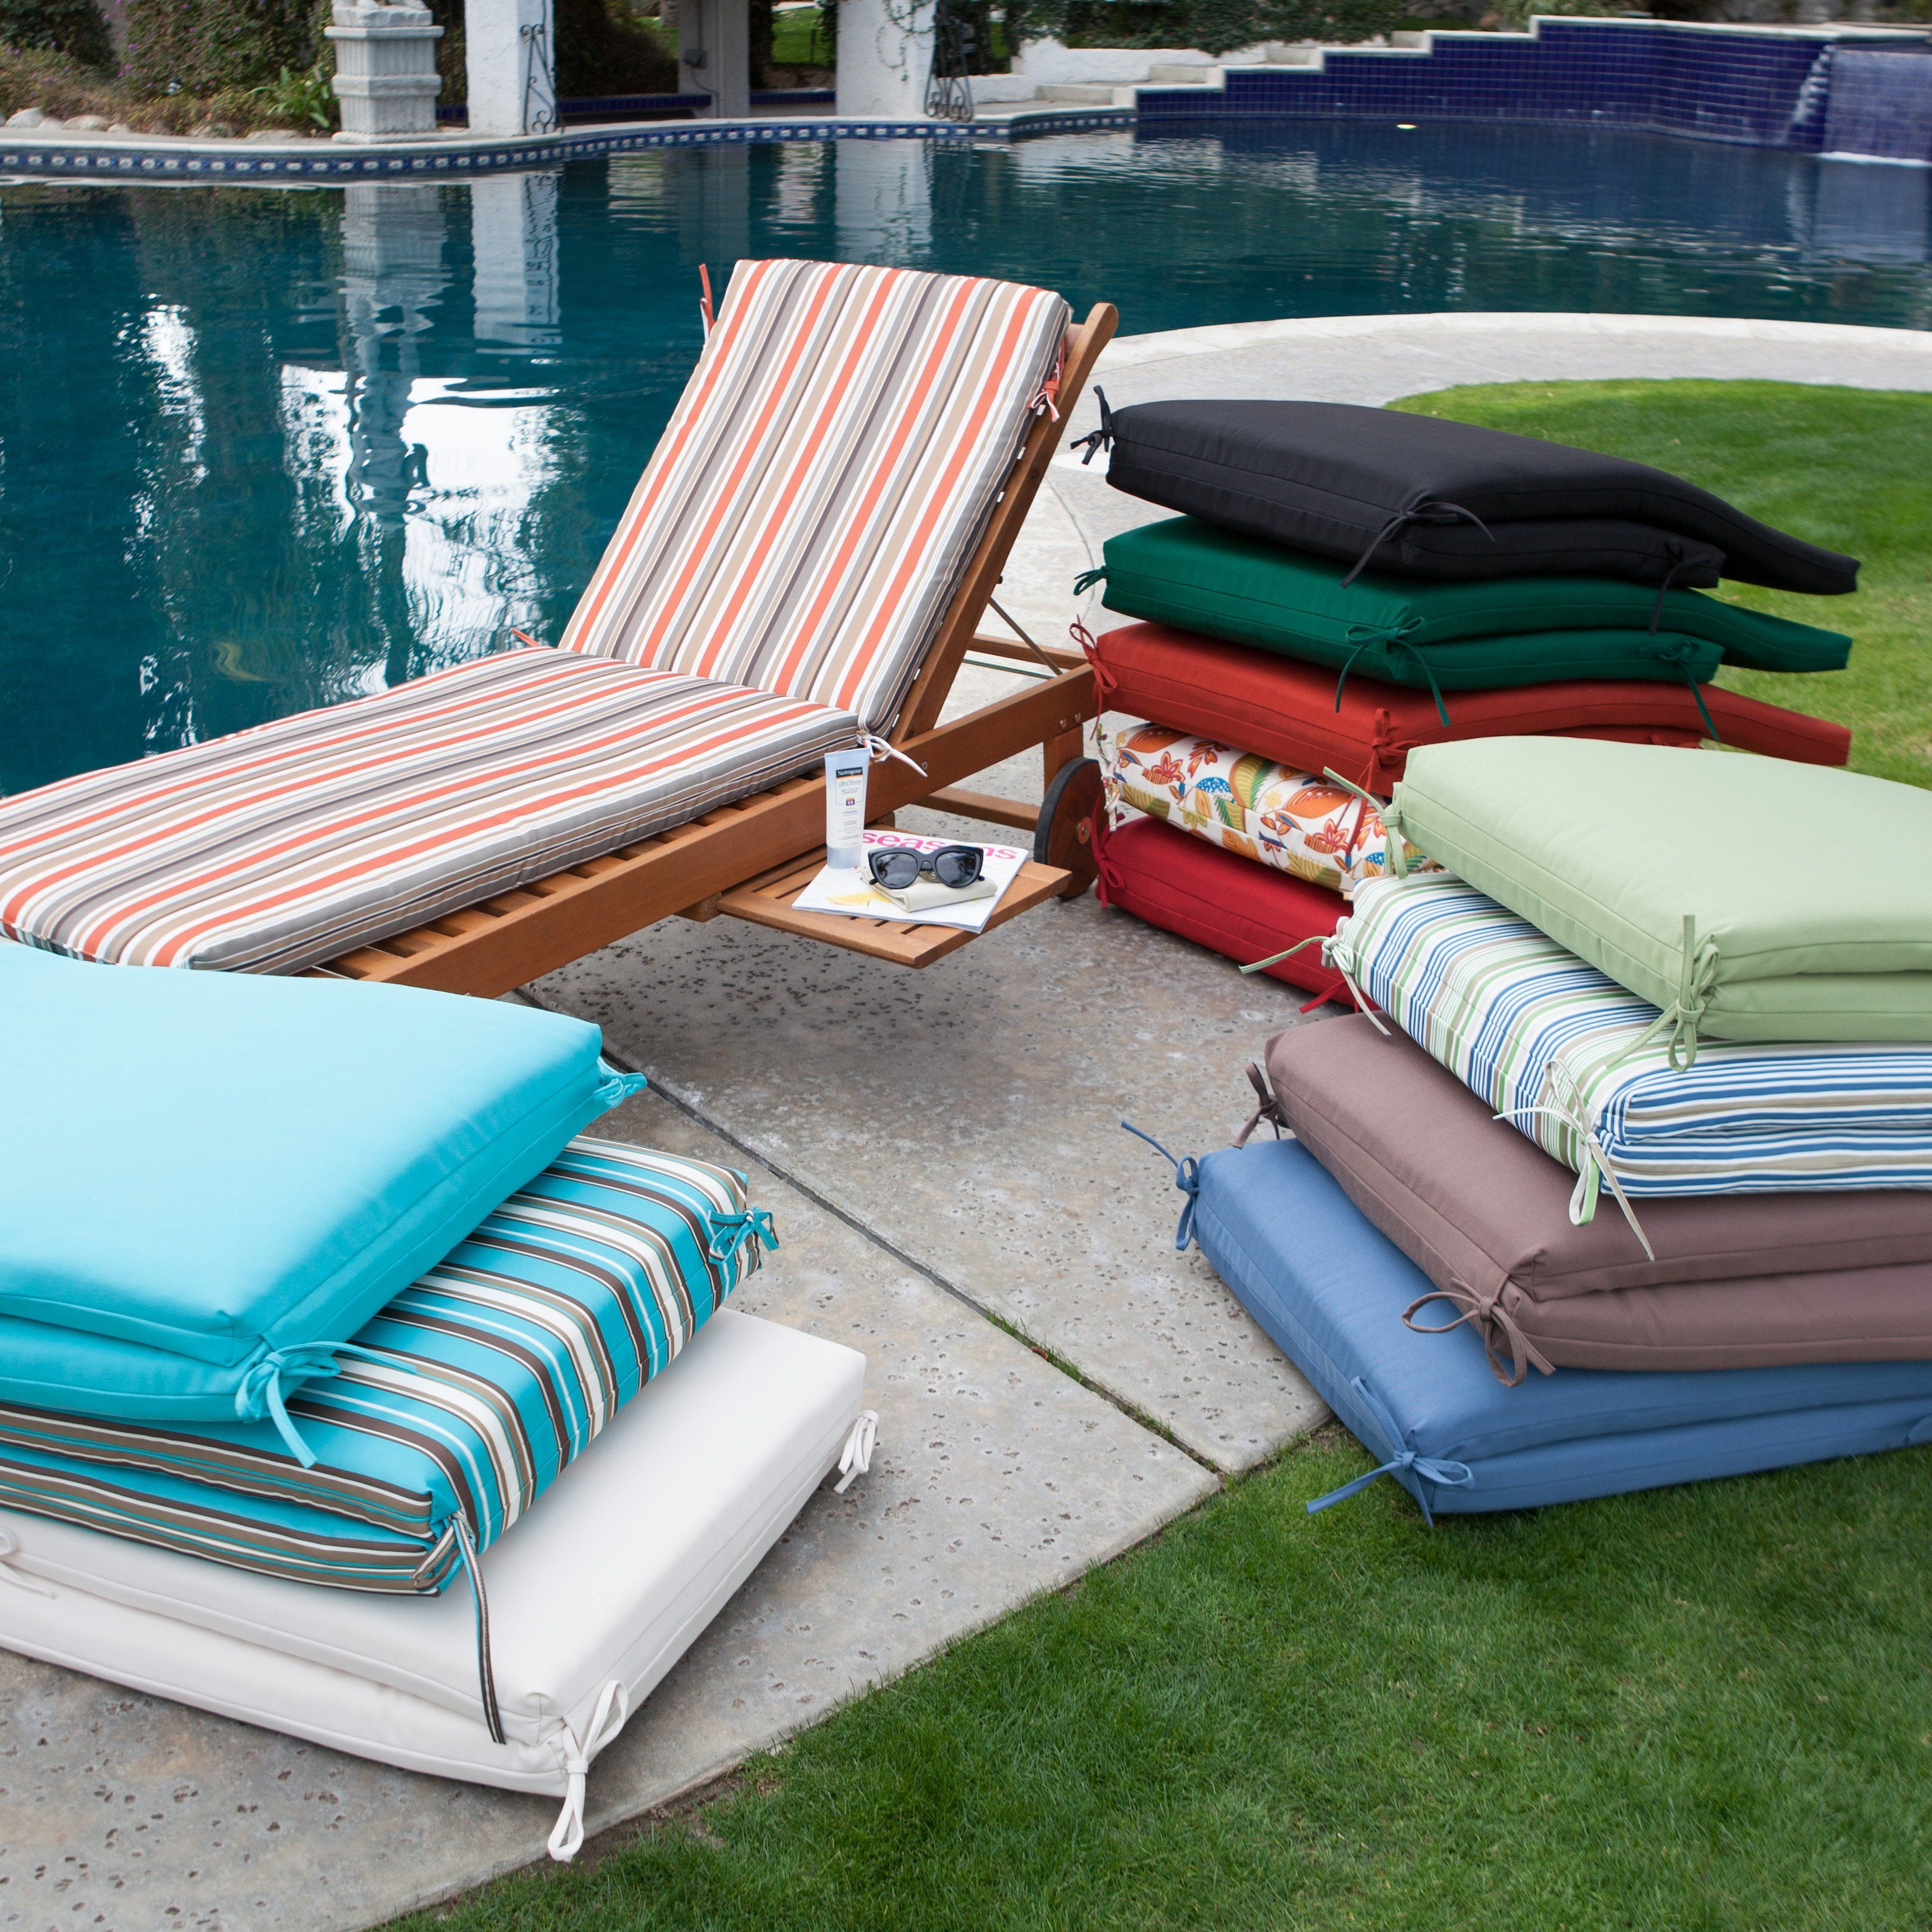 Chaise Lounge Cushion Slipcovers Chaise Lounge Cushions Lounge Cushions Patio Chaise Lounge Cushions